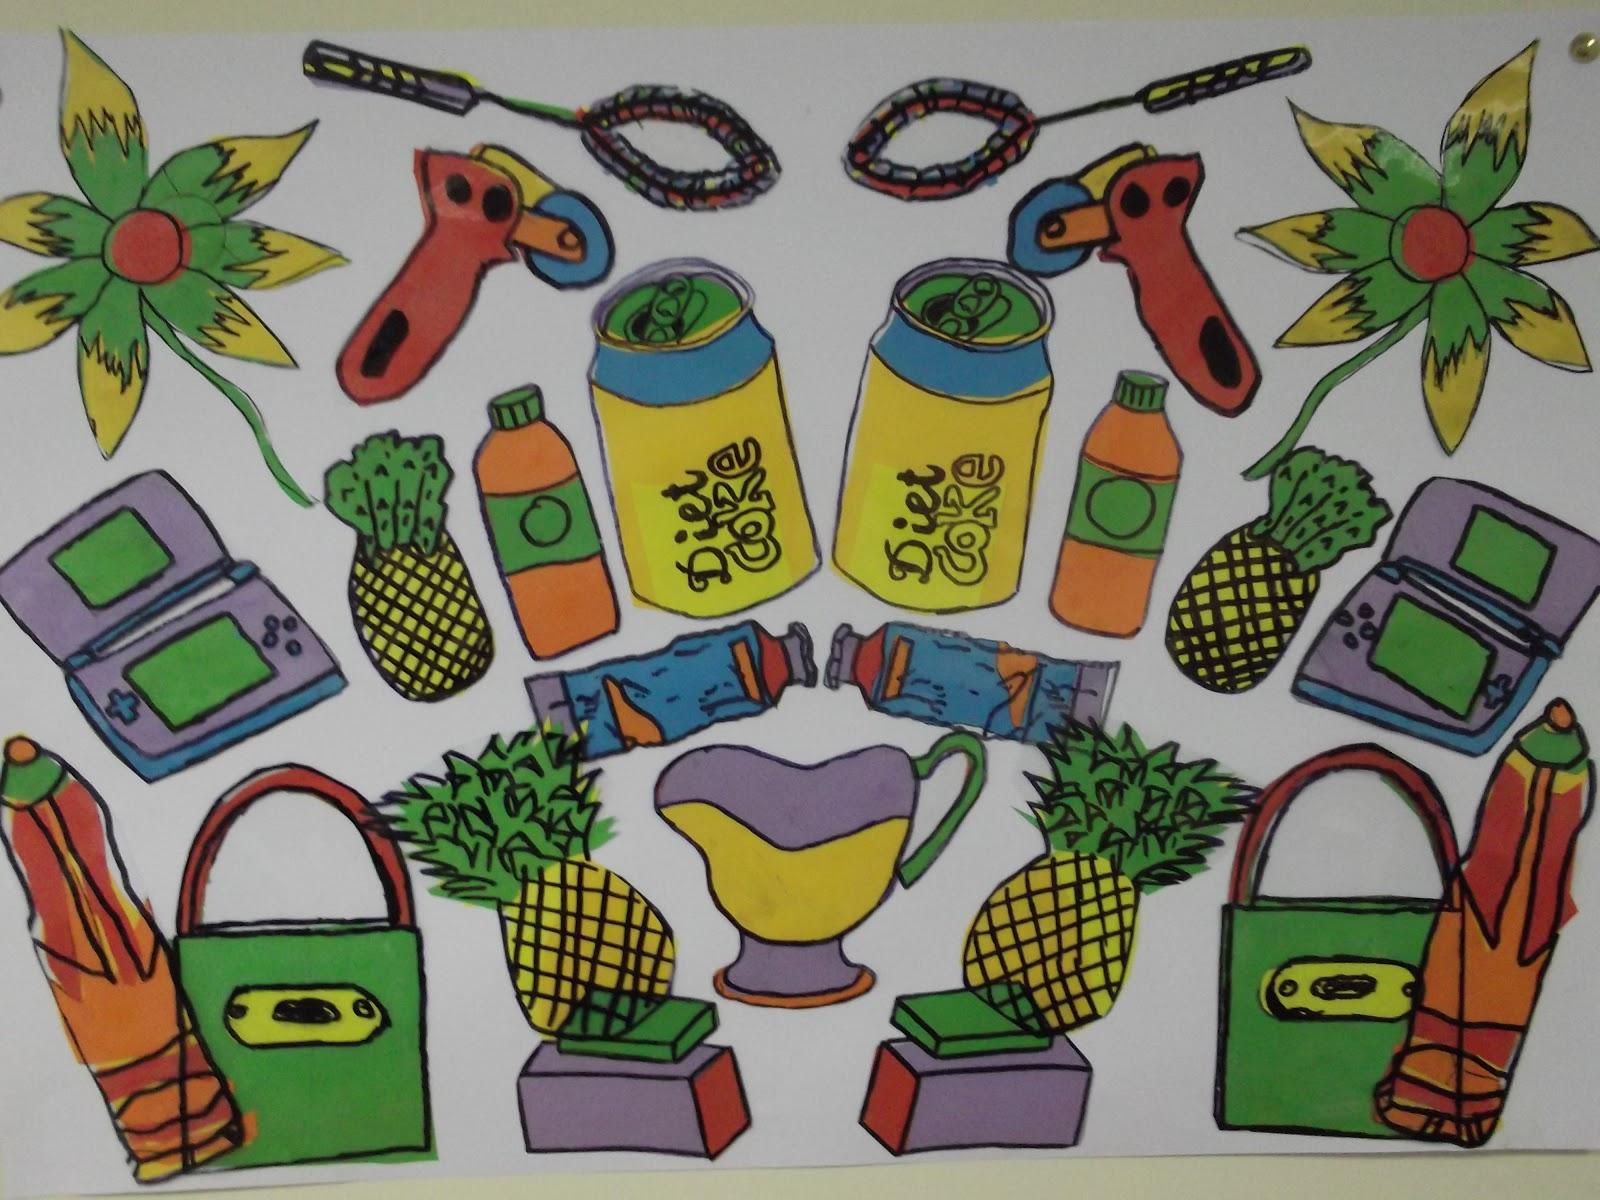 PCA - Art Blog: 2nd Year - Michael Craig Martin and Pop Art Project